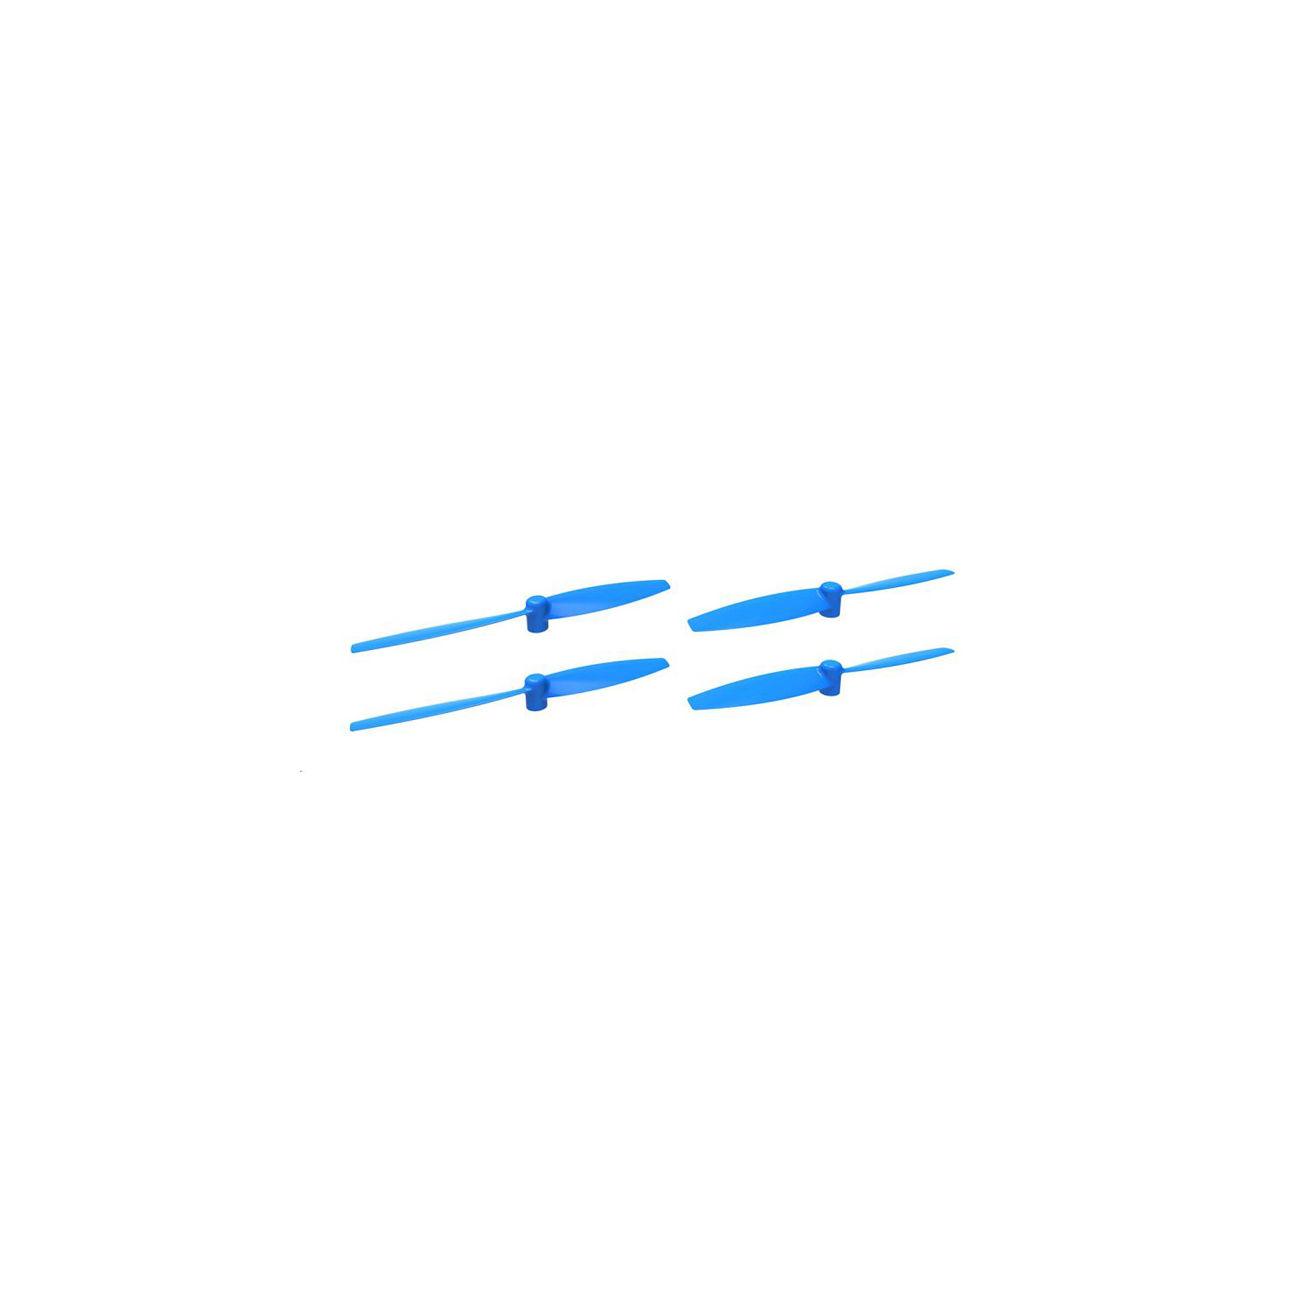 Parrot Minidrone Airborne Night & Airborne Cargo Review | Tom